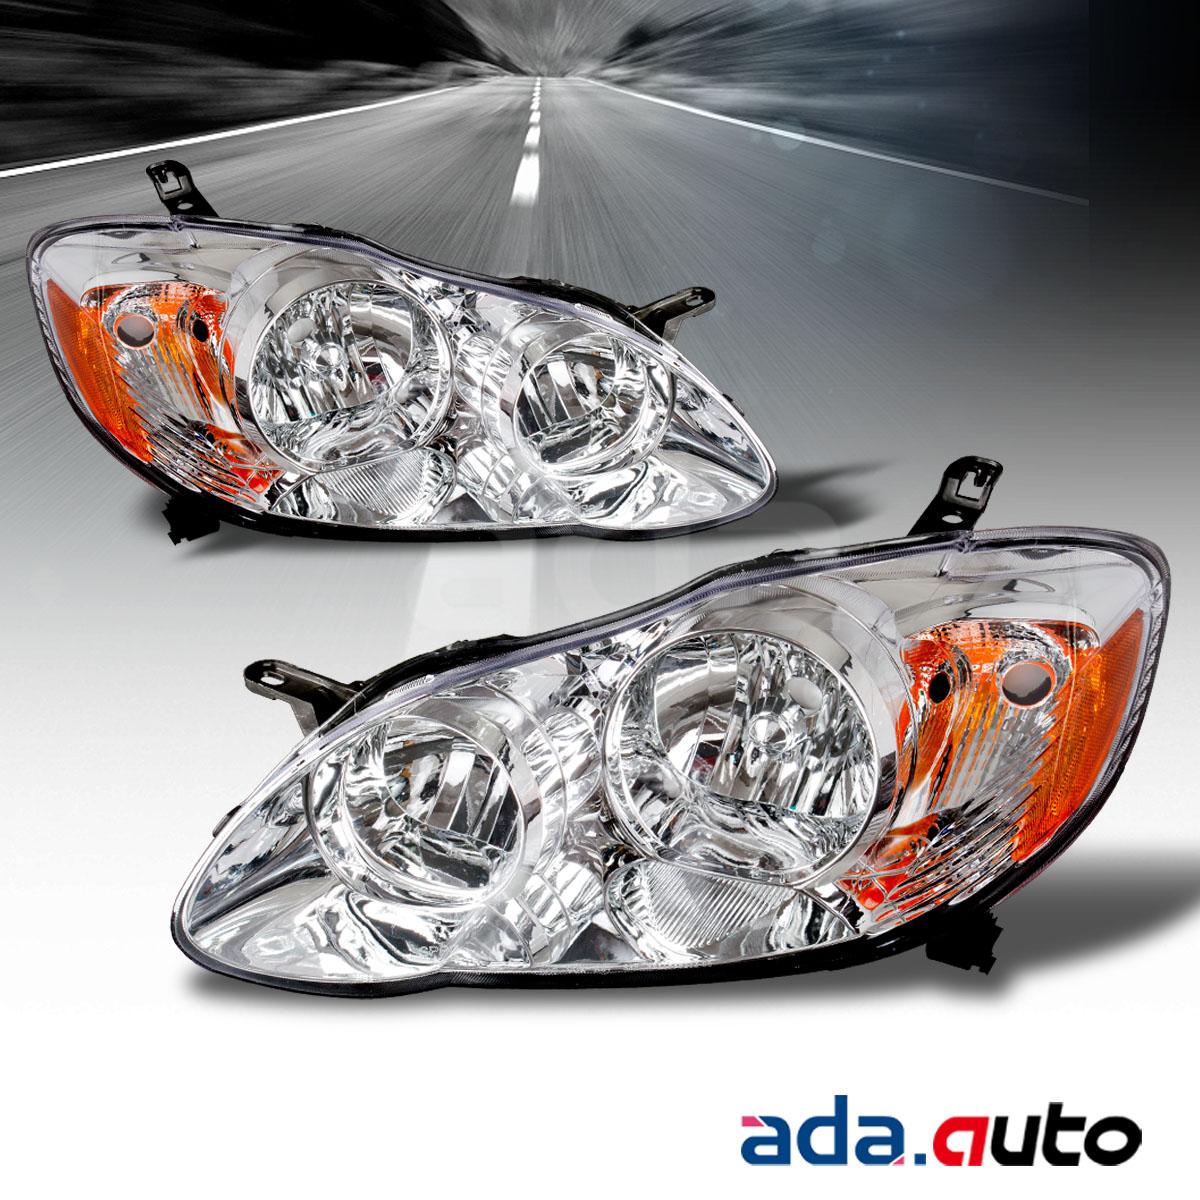 2005 toyota corolla headlights